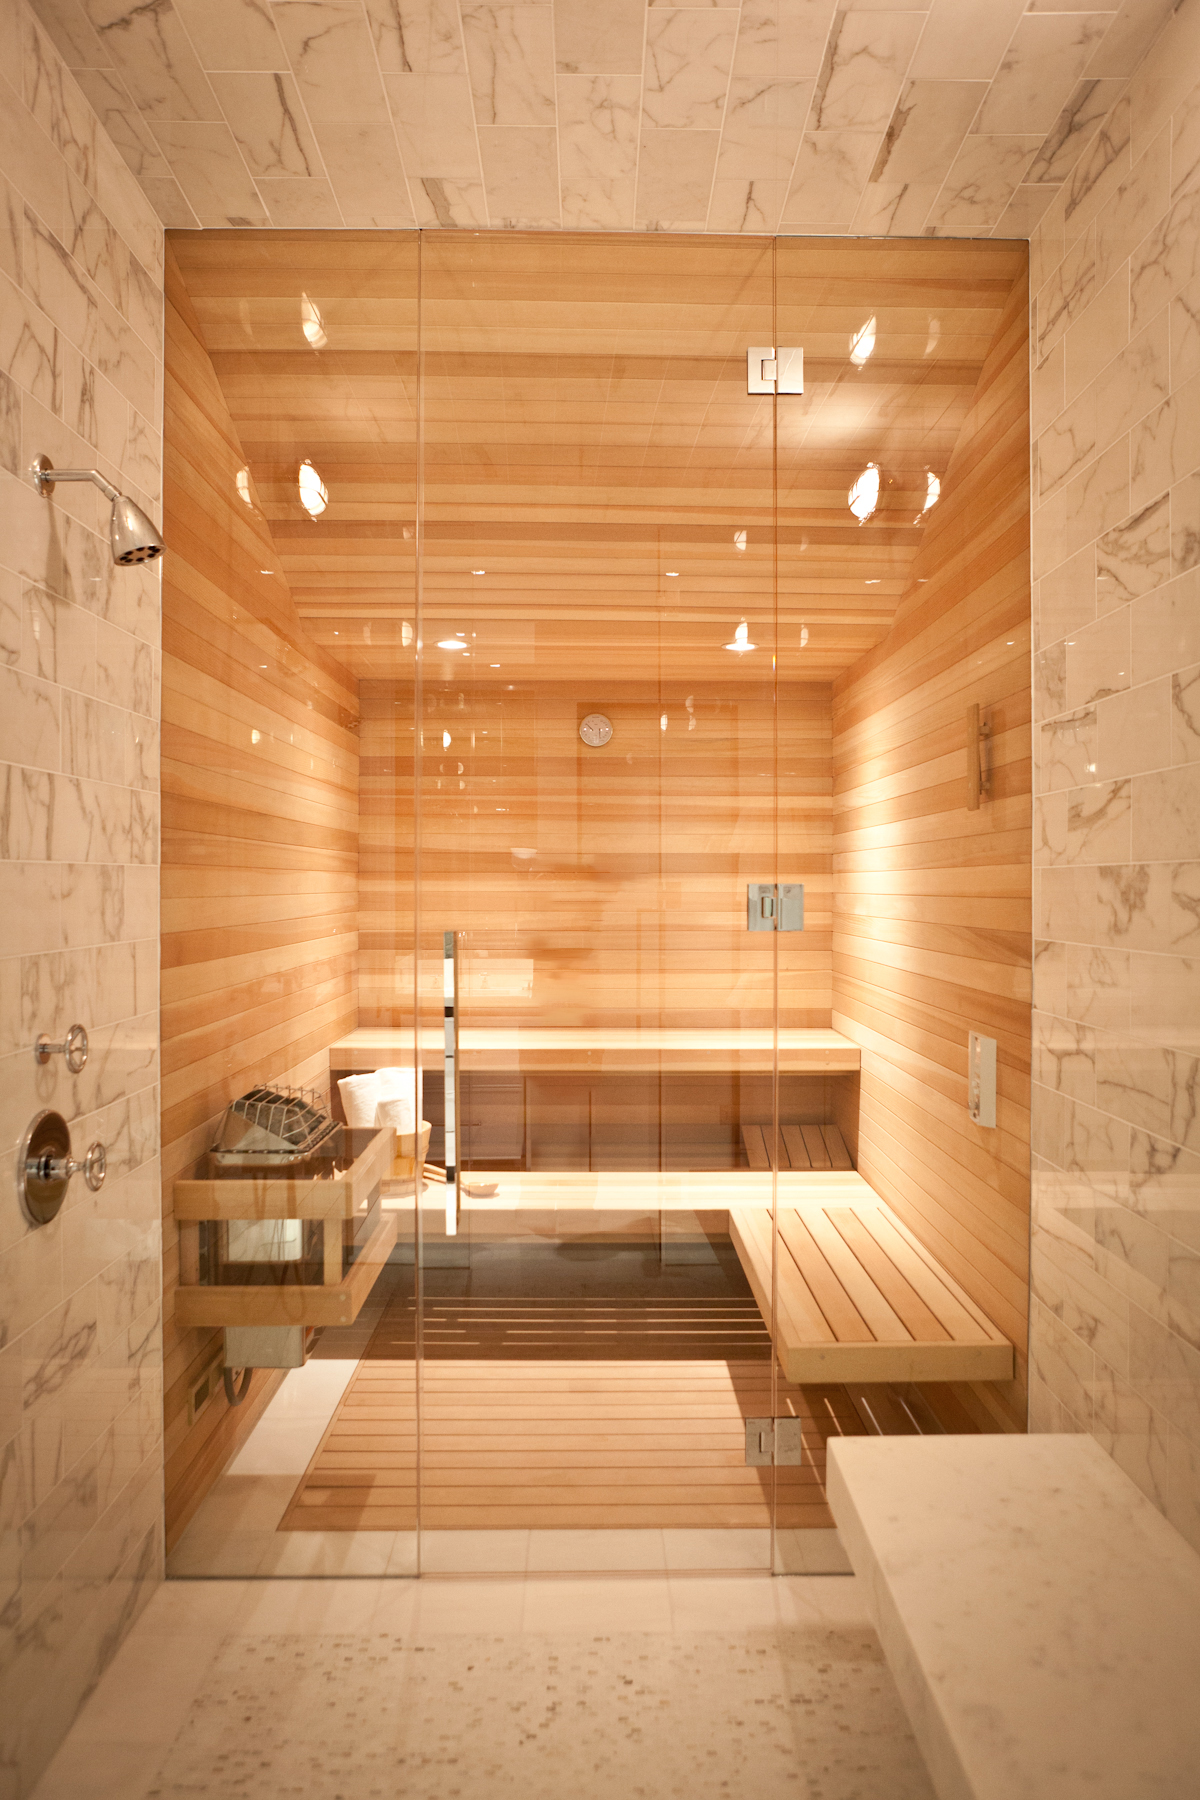 Presidio Heights Residence featuring pass-through sauna/steam room by Marsh & Clark Design